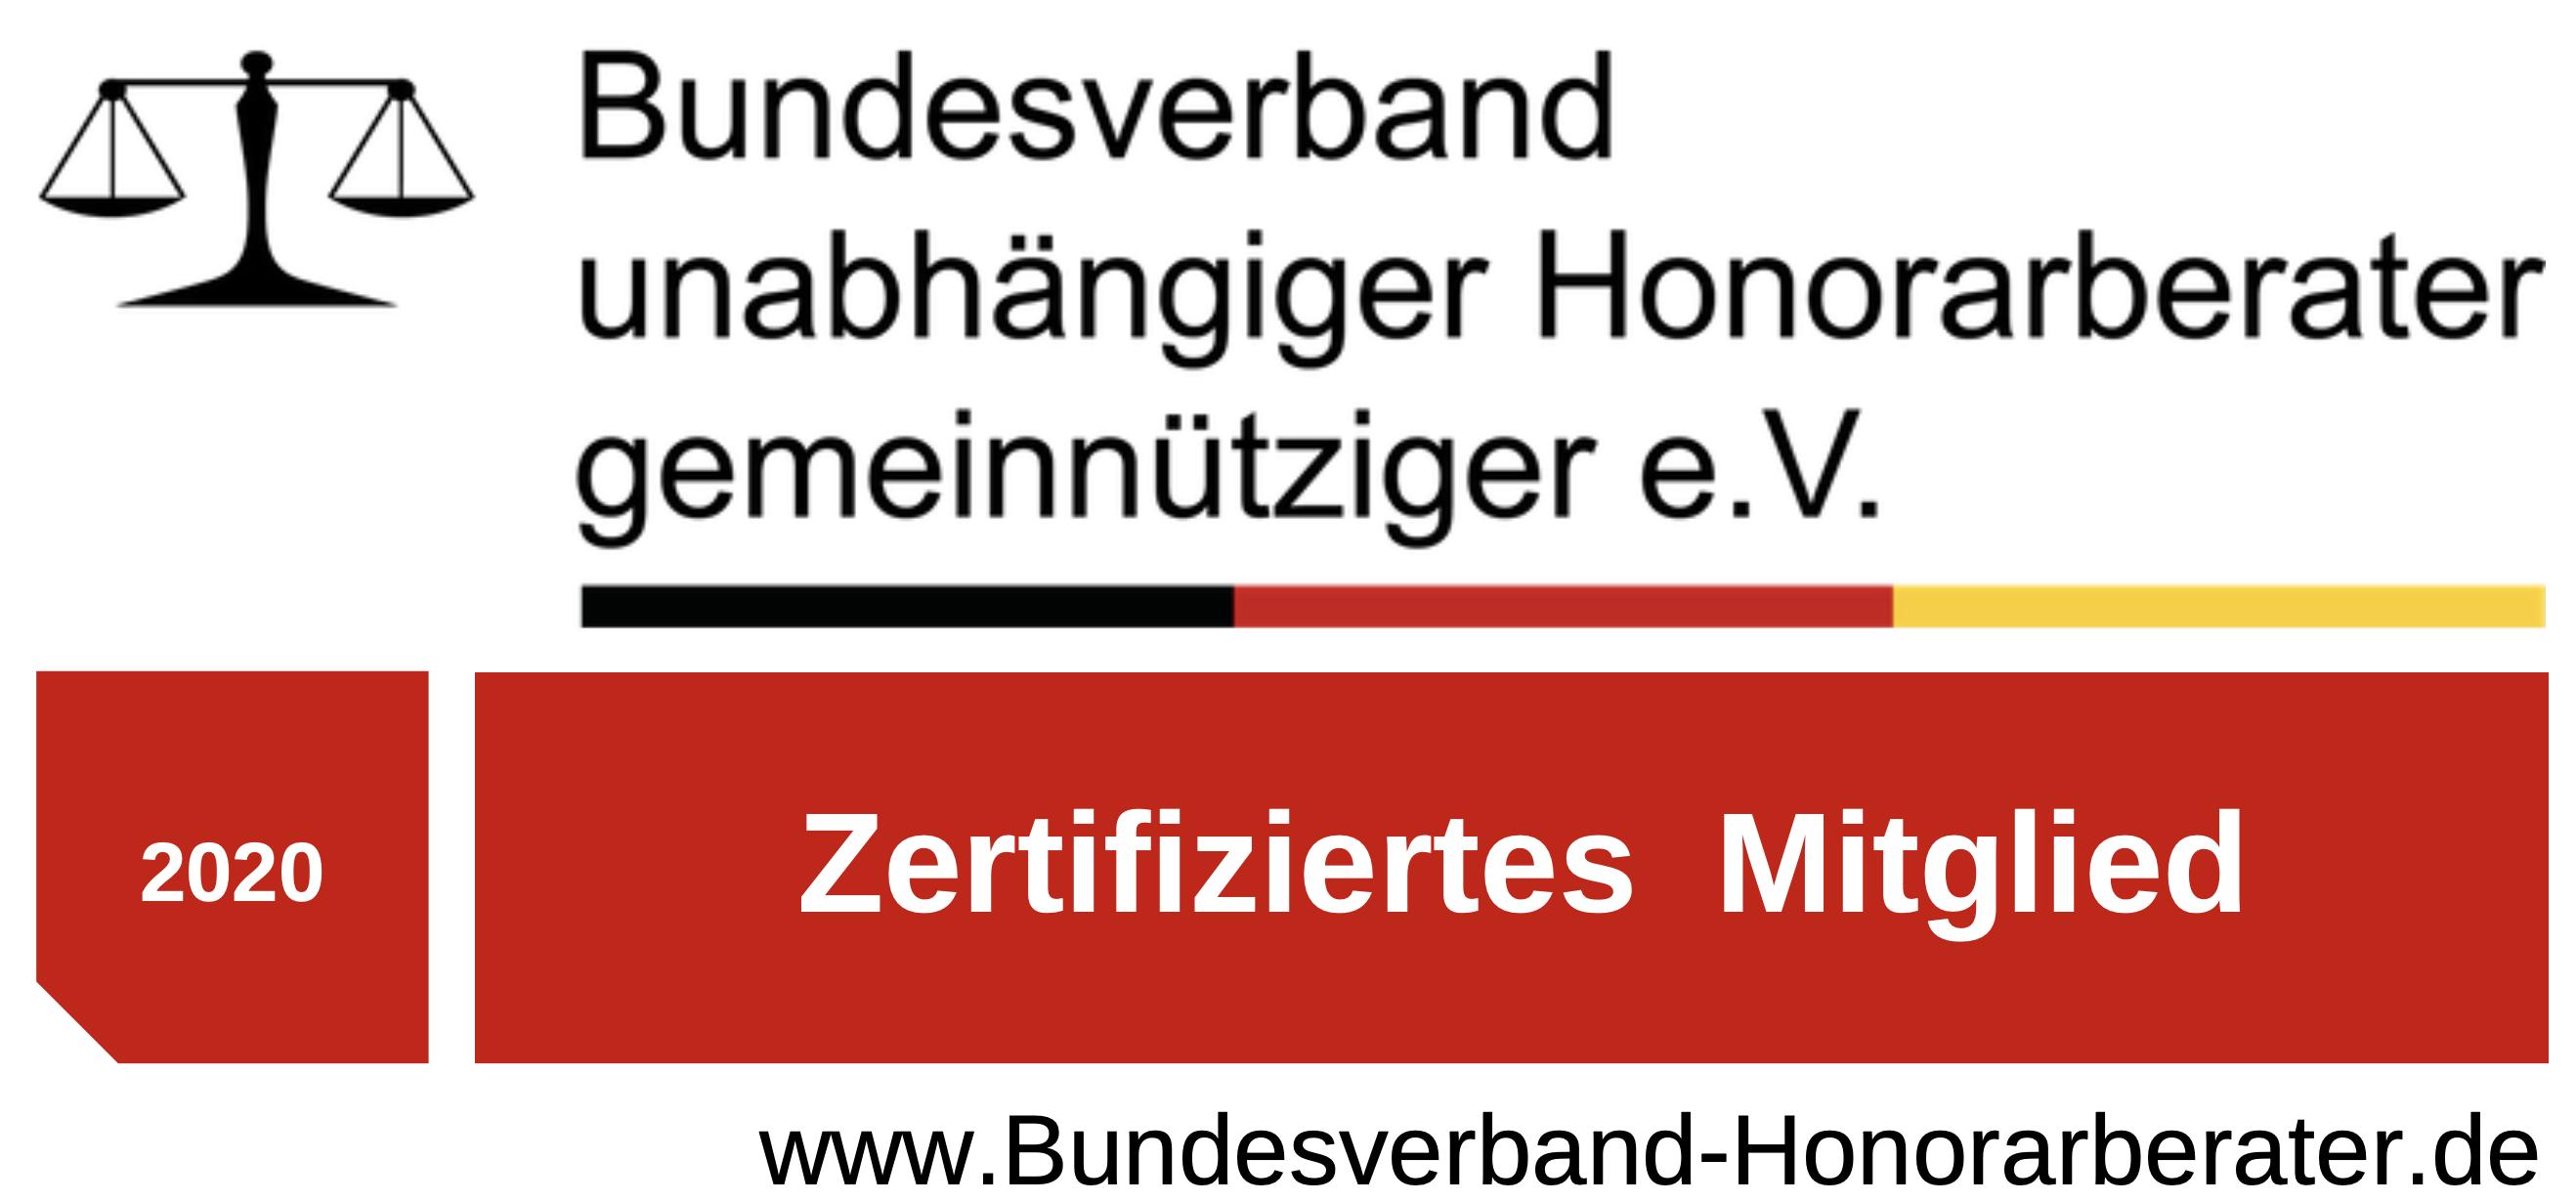 Bundesverband unabhängiger Honorarberater gemeinnütziger e. V.